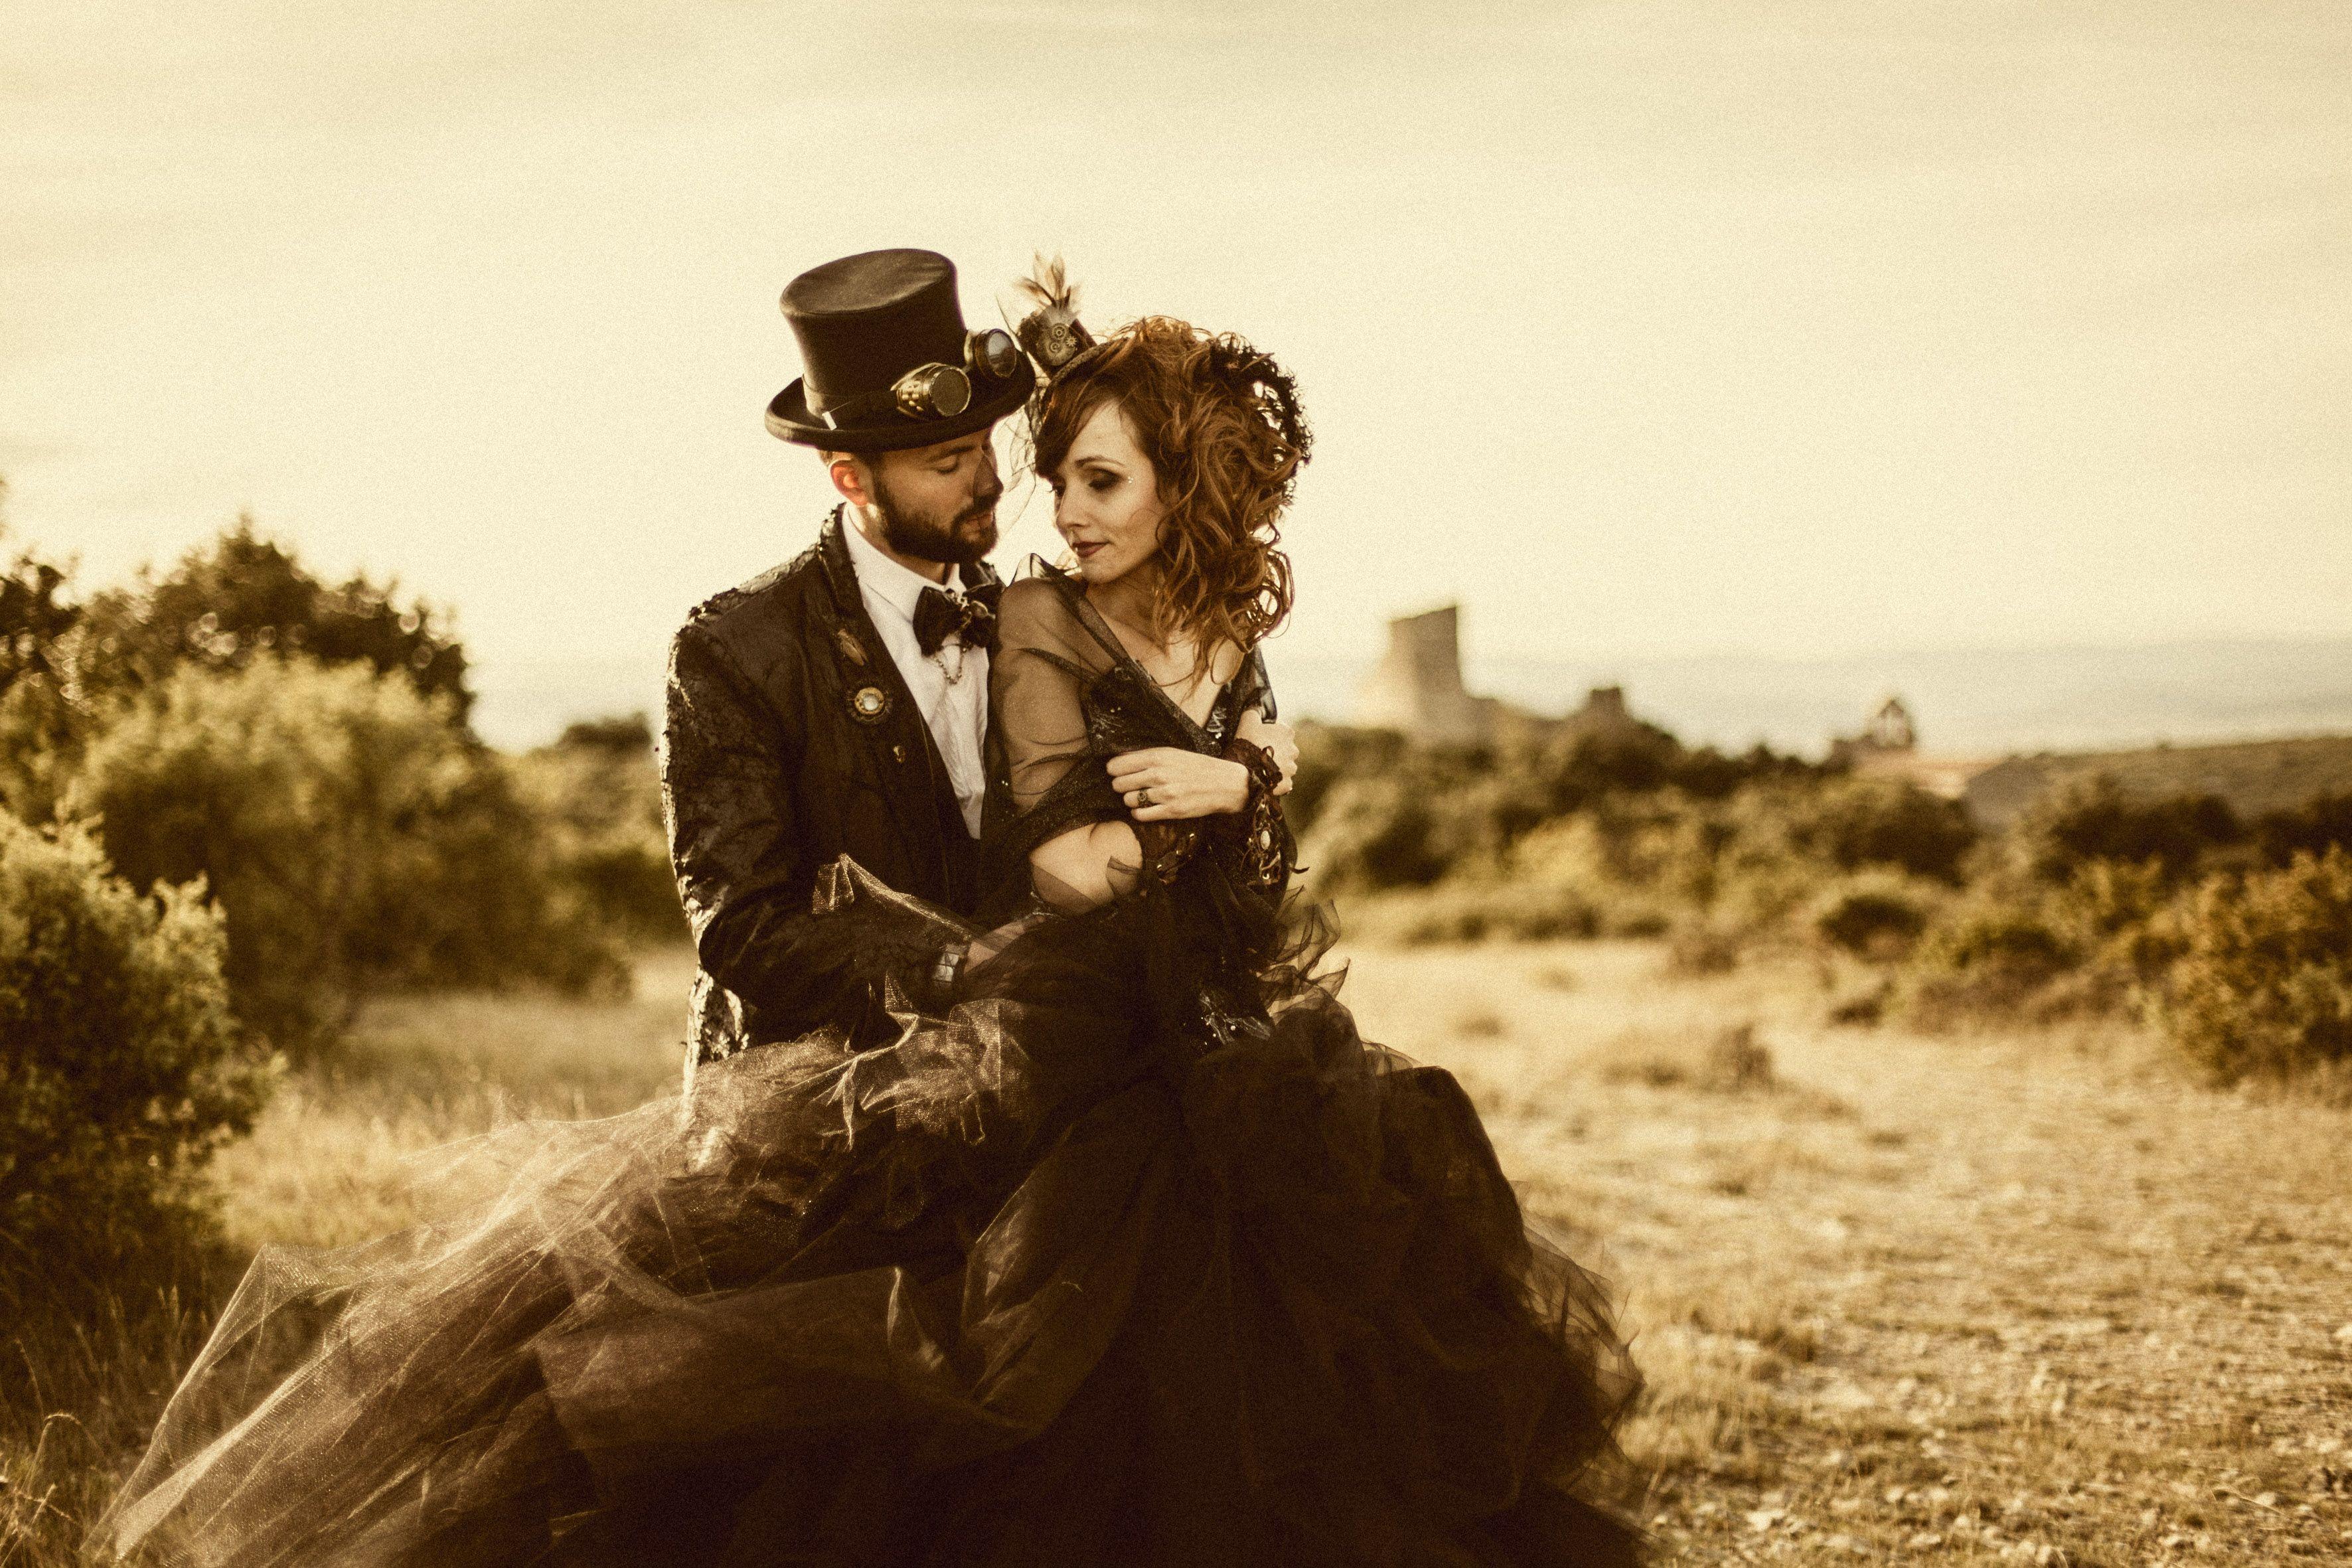 Mariage Steampunk dress robe et costume